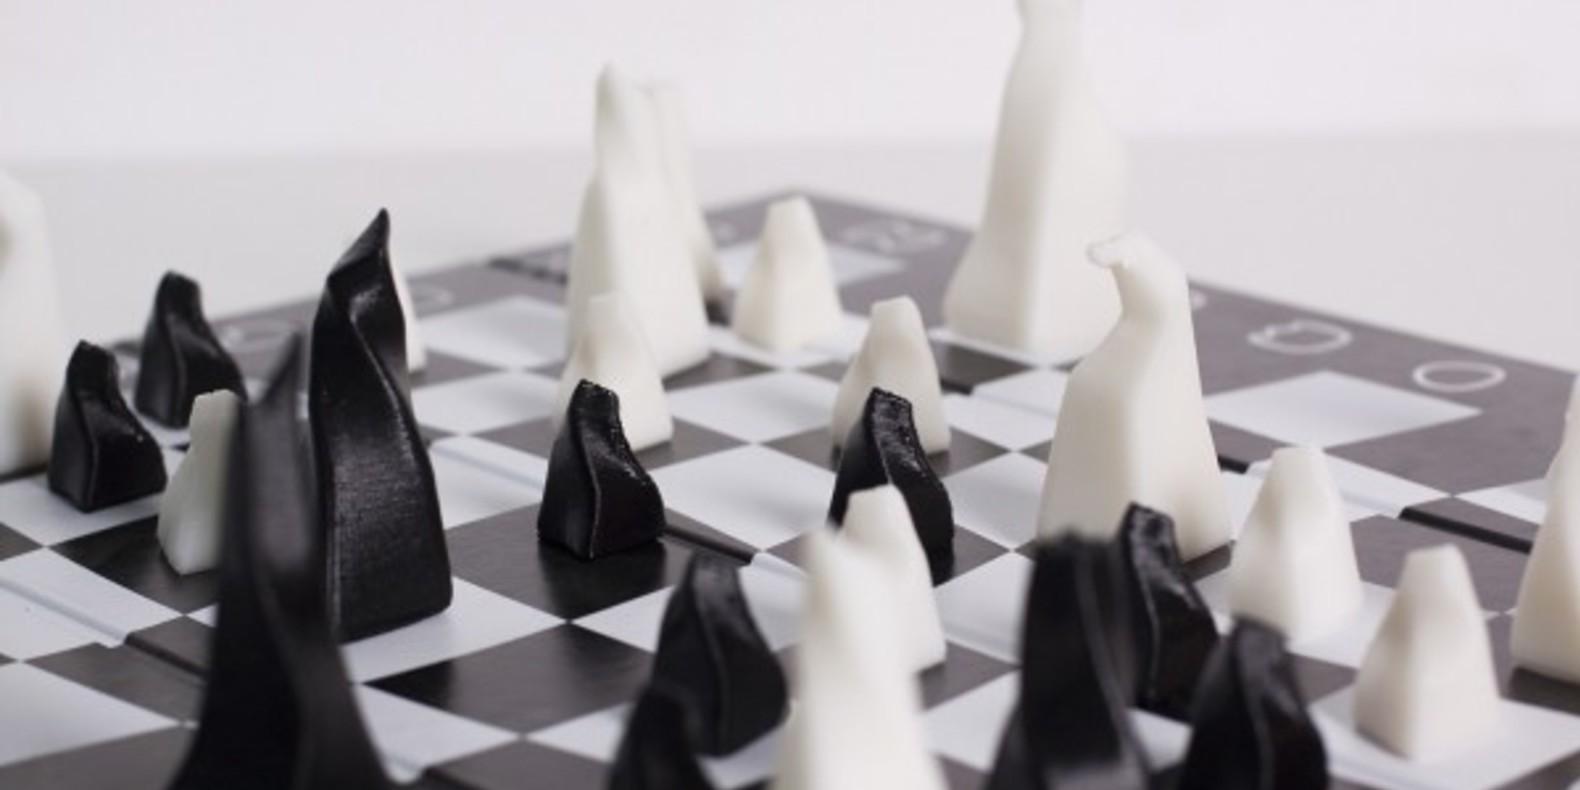 Jeu d' échecs 3D printed imprimé en 3D artur denys cults fichier 3D STL